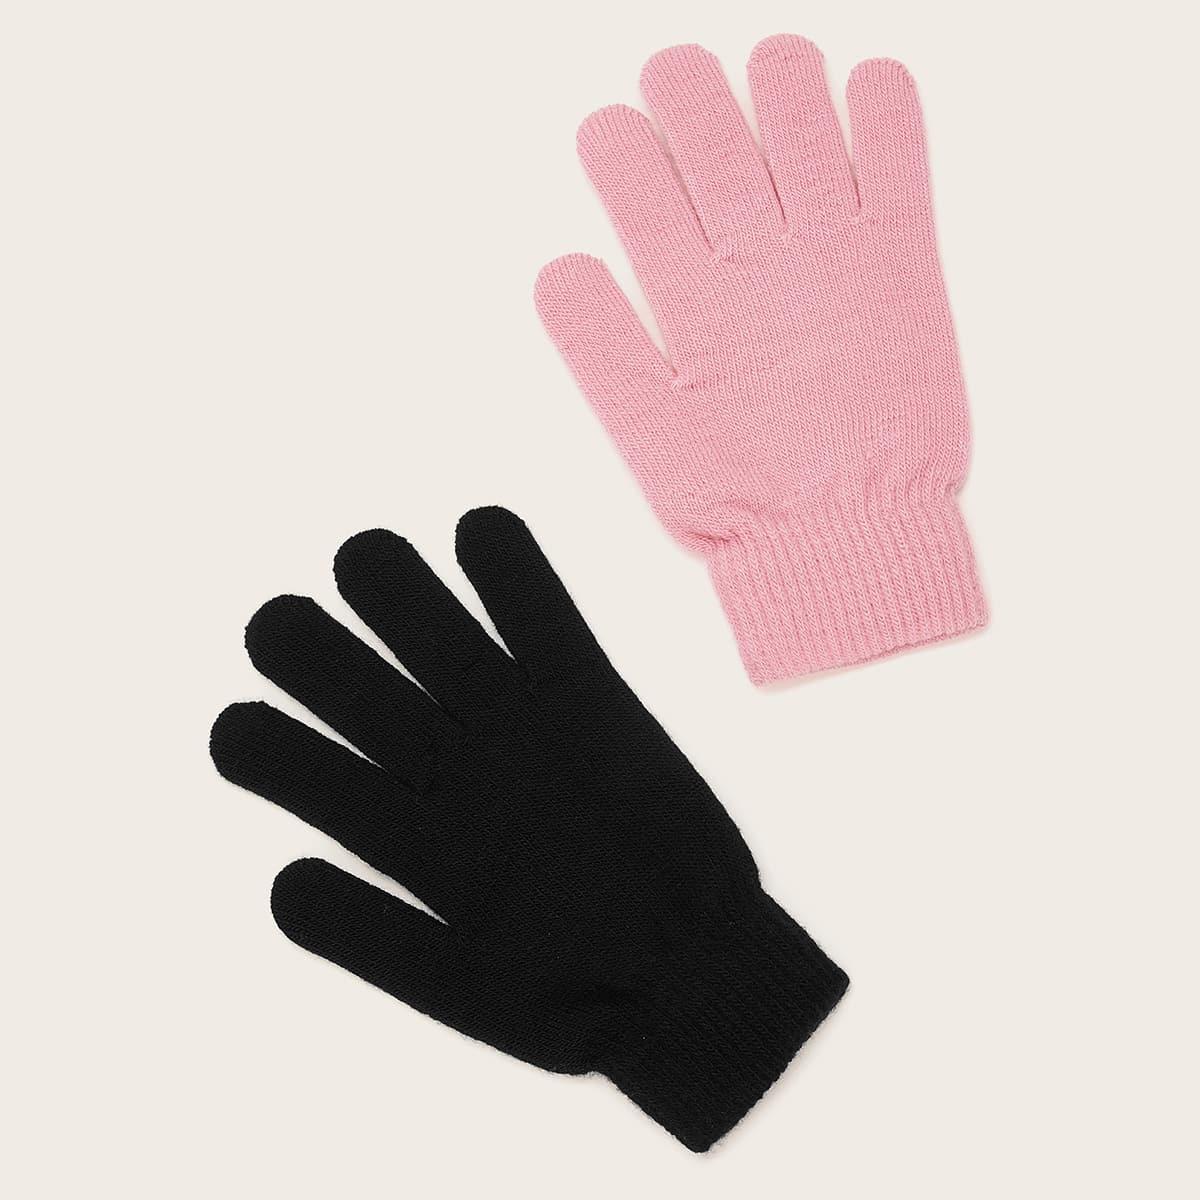 Однотонные вязаные перчатки 2 пары от SHEIN